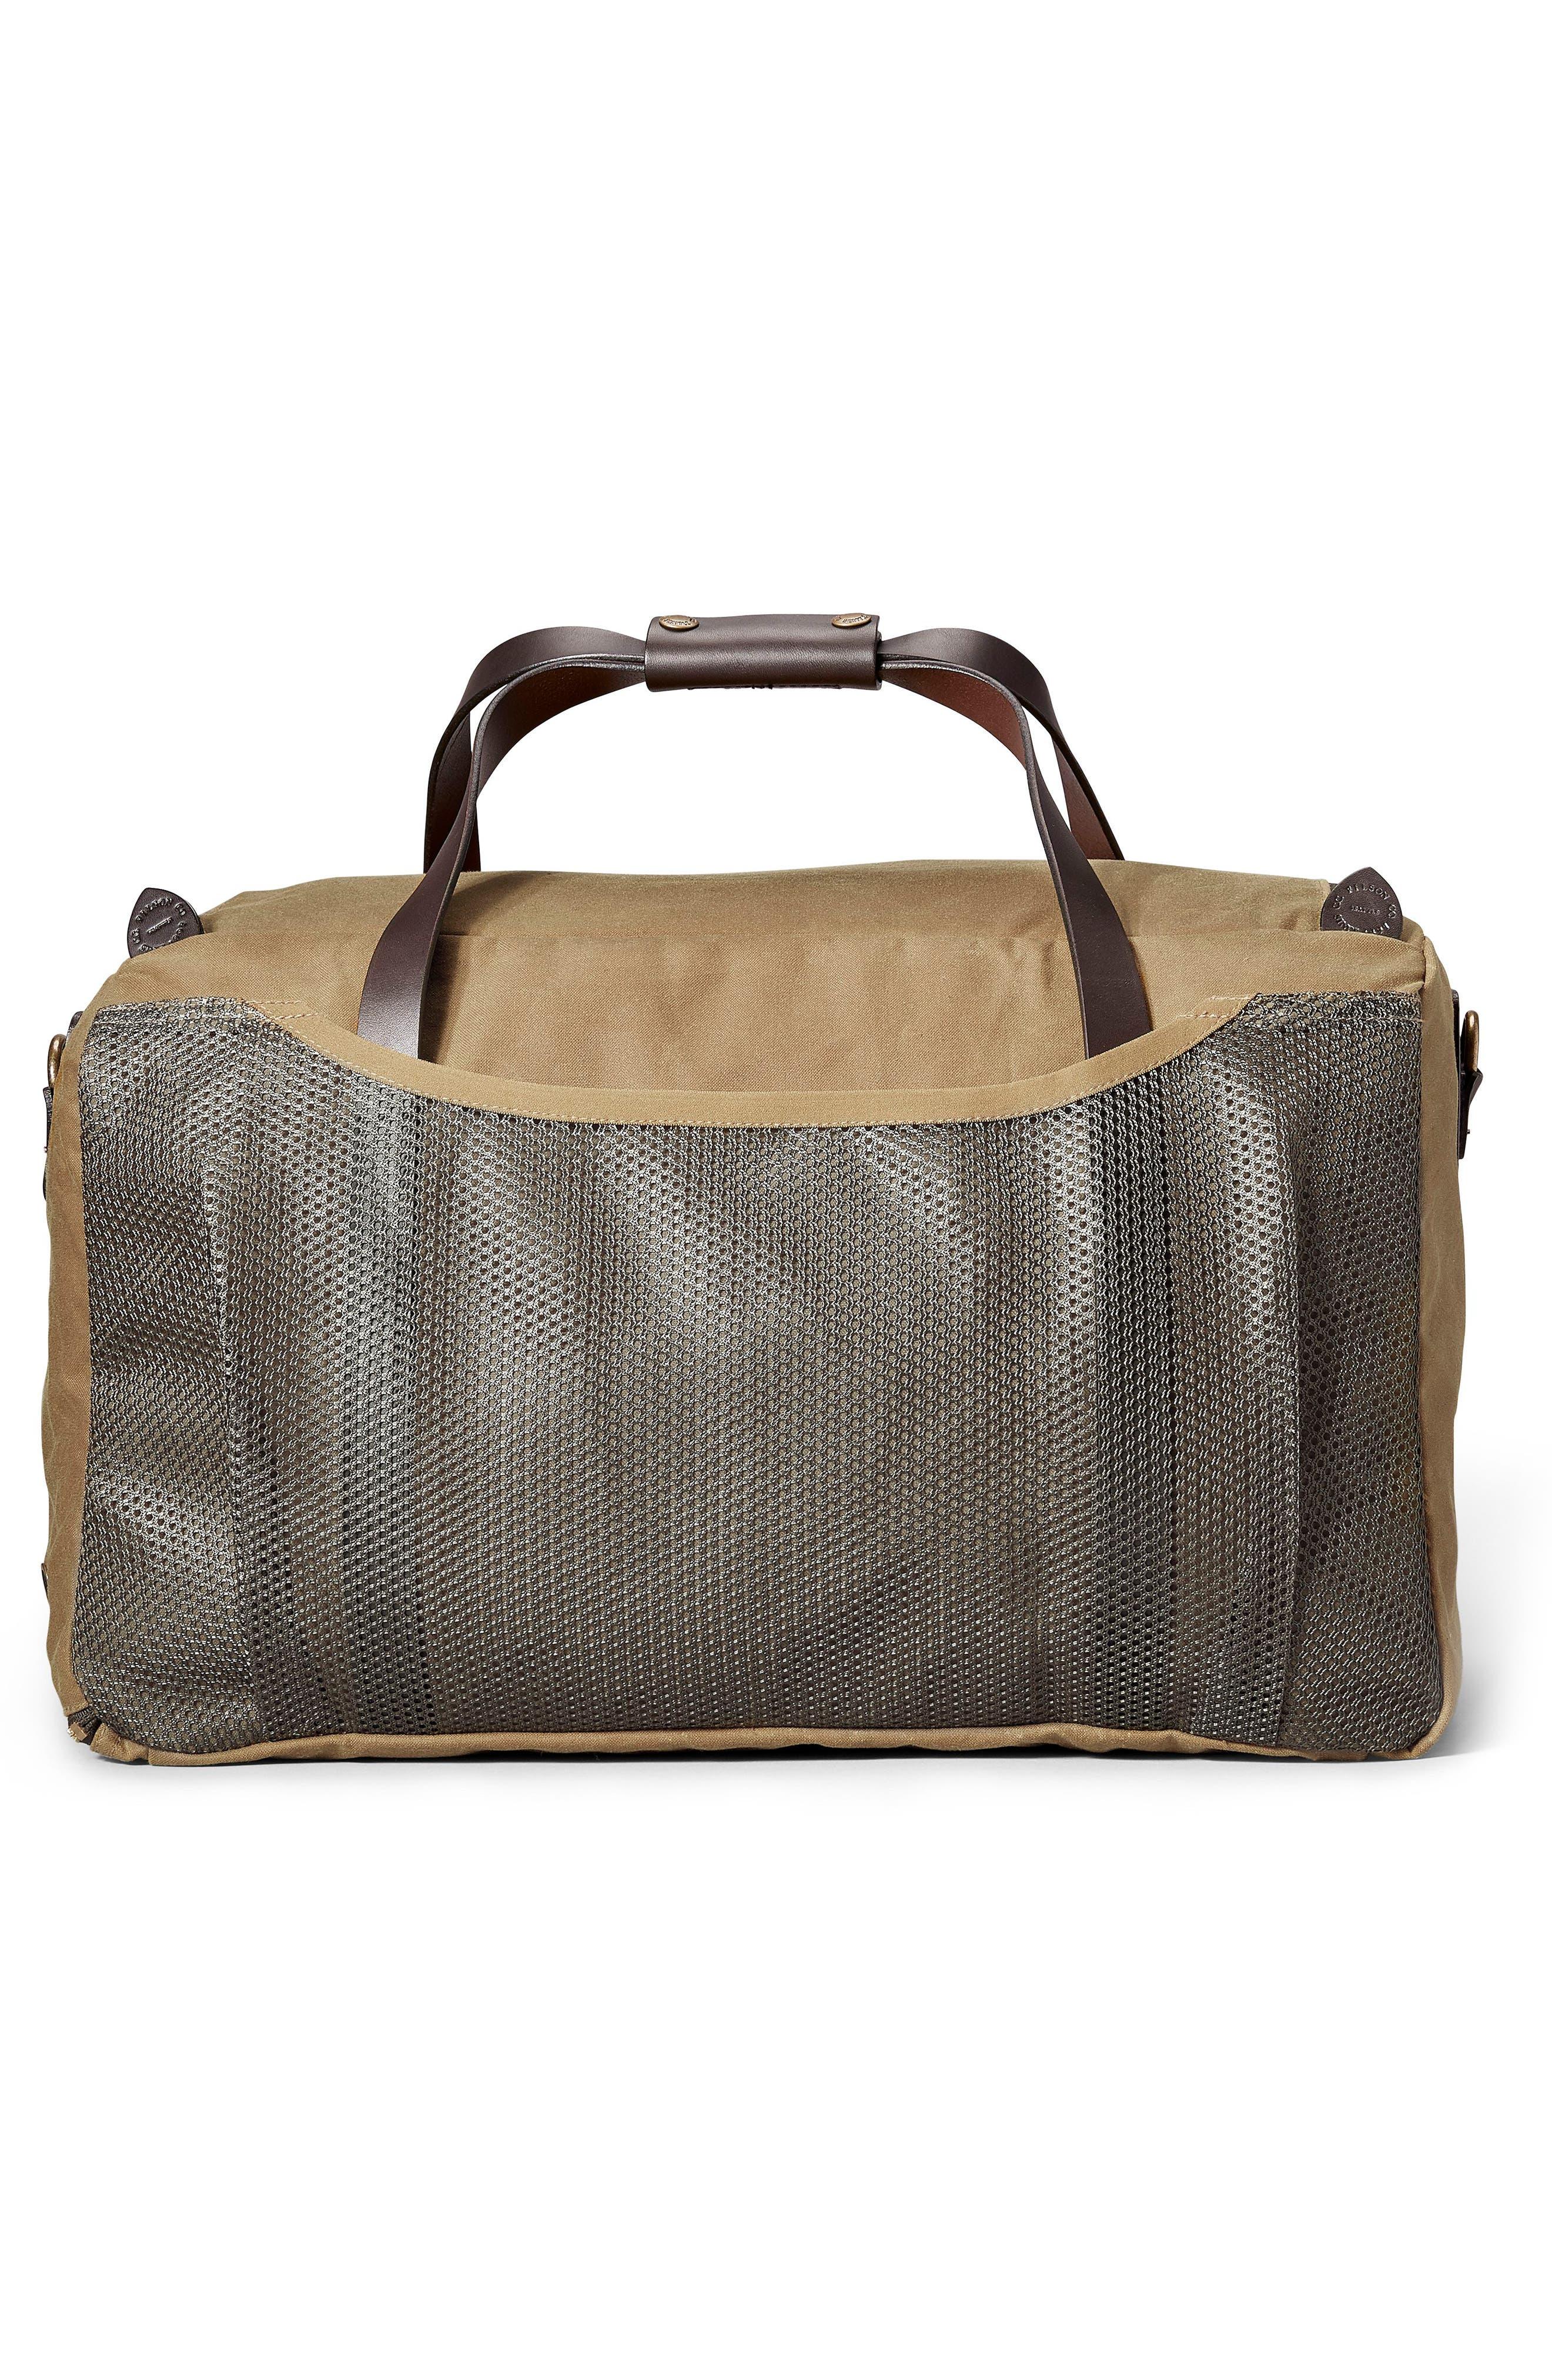 Excursion Duffel Bag,                             Alternate thumbnail 2, color,                             Tan